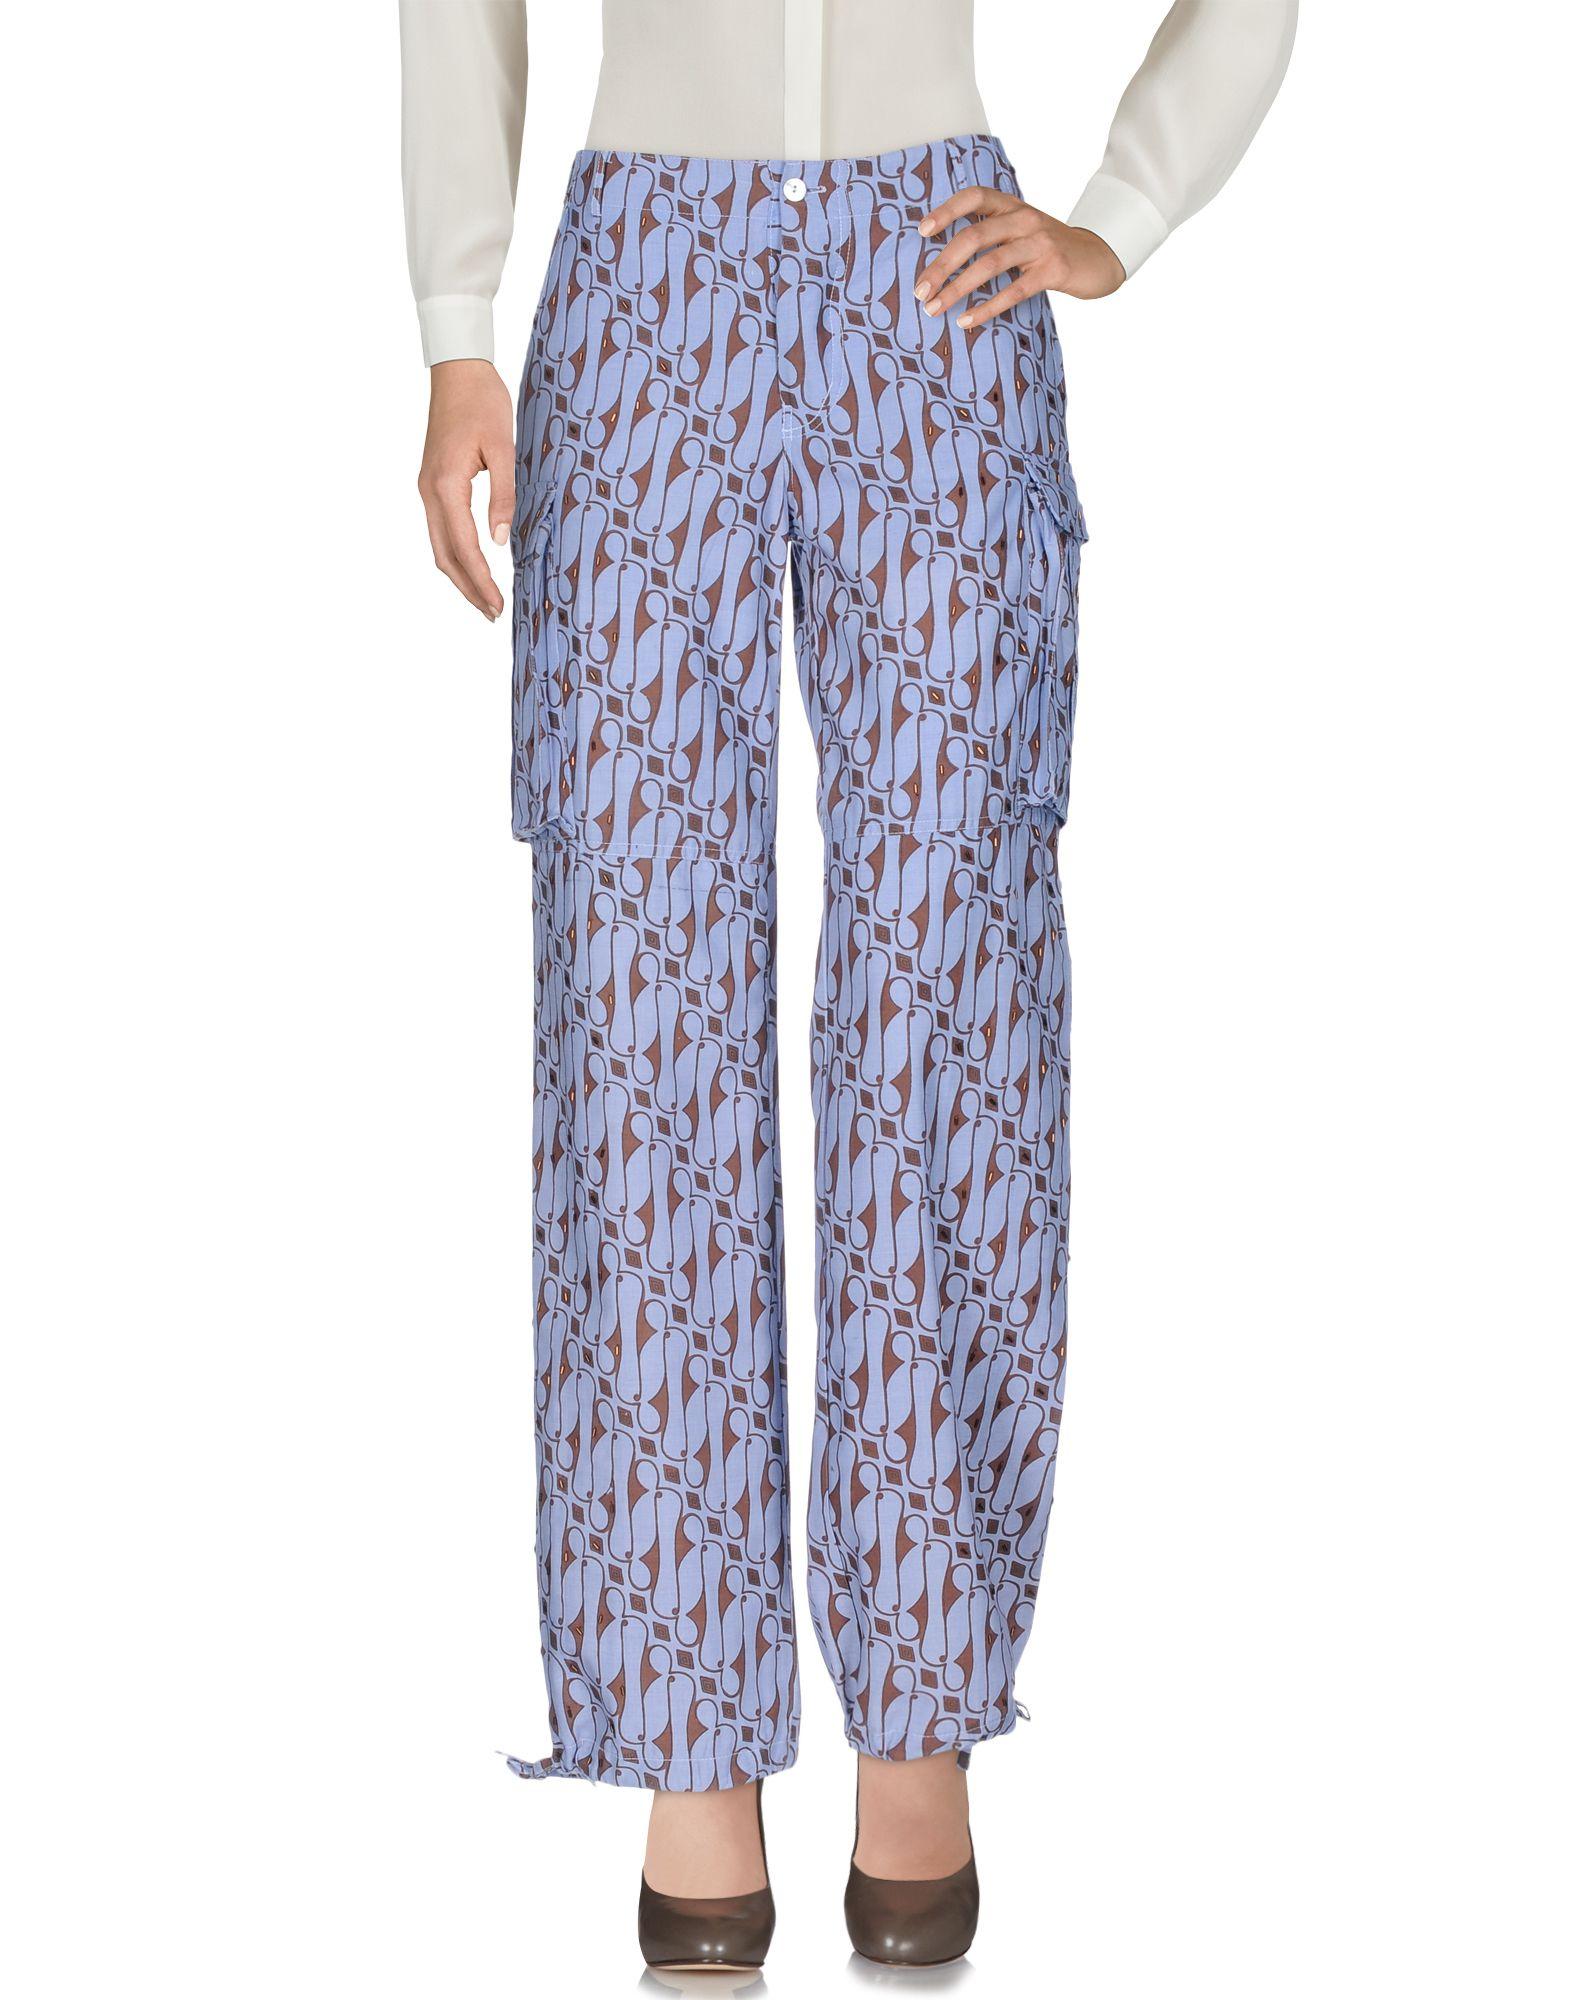 Pantalone P.A.R.O.S.H. donna - - 13077580NB  Outlet zum Verkauf